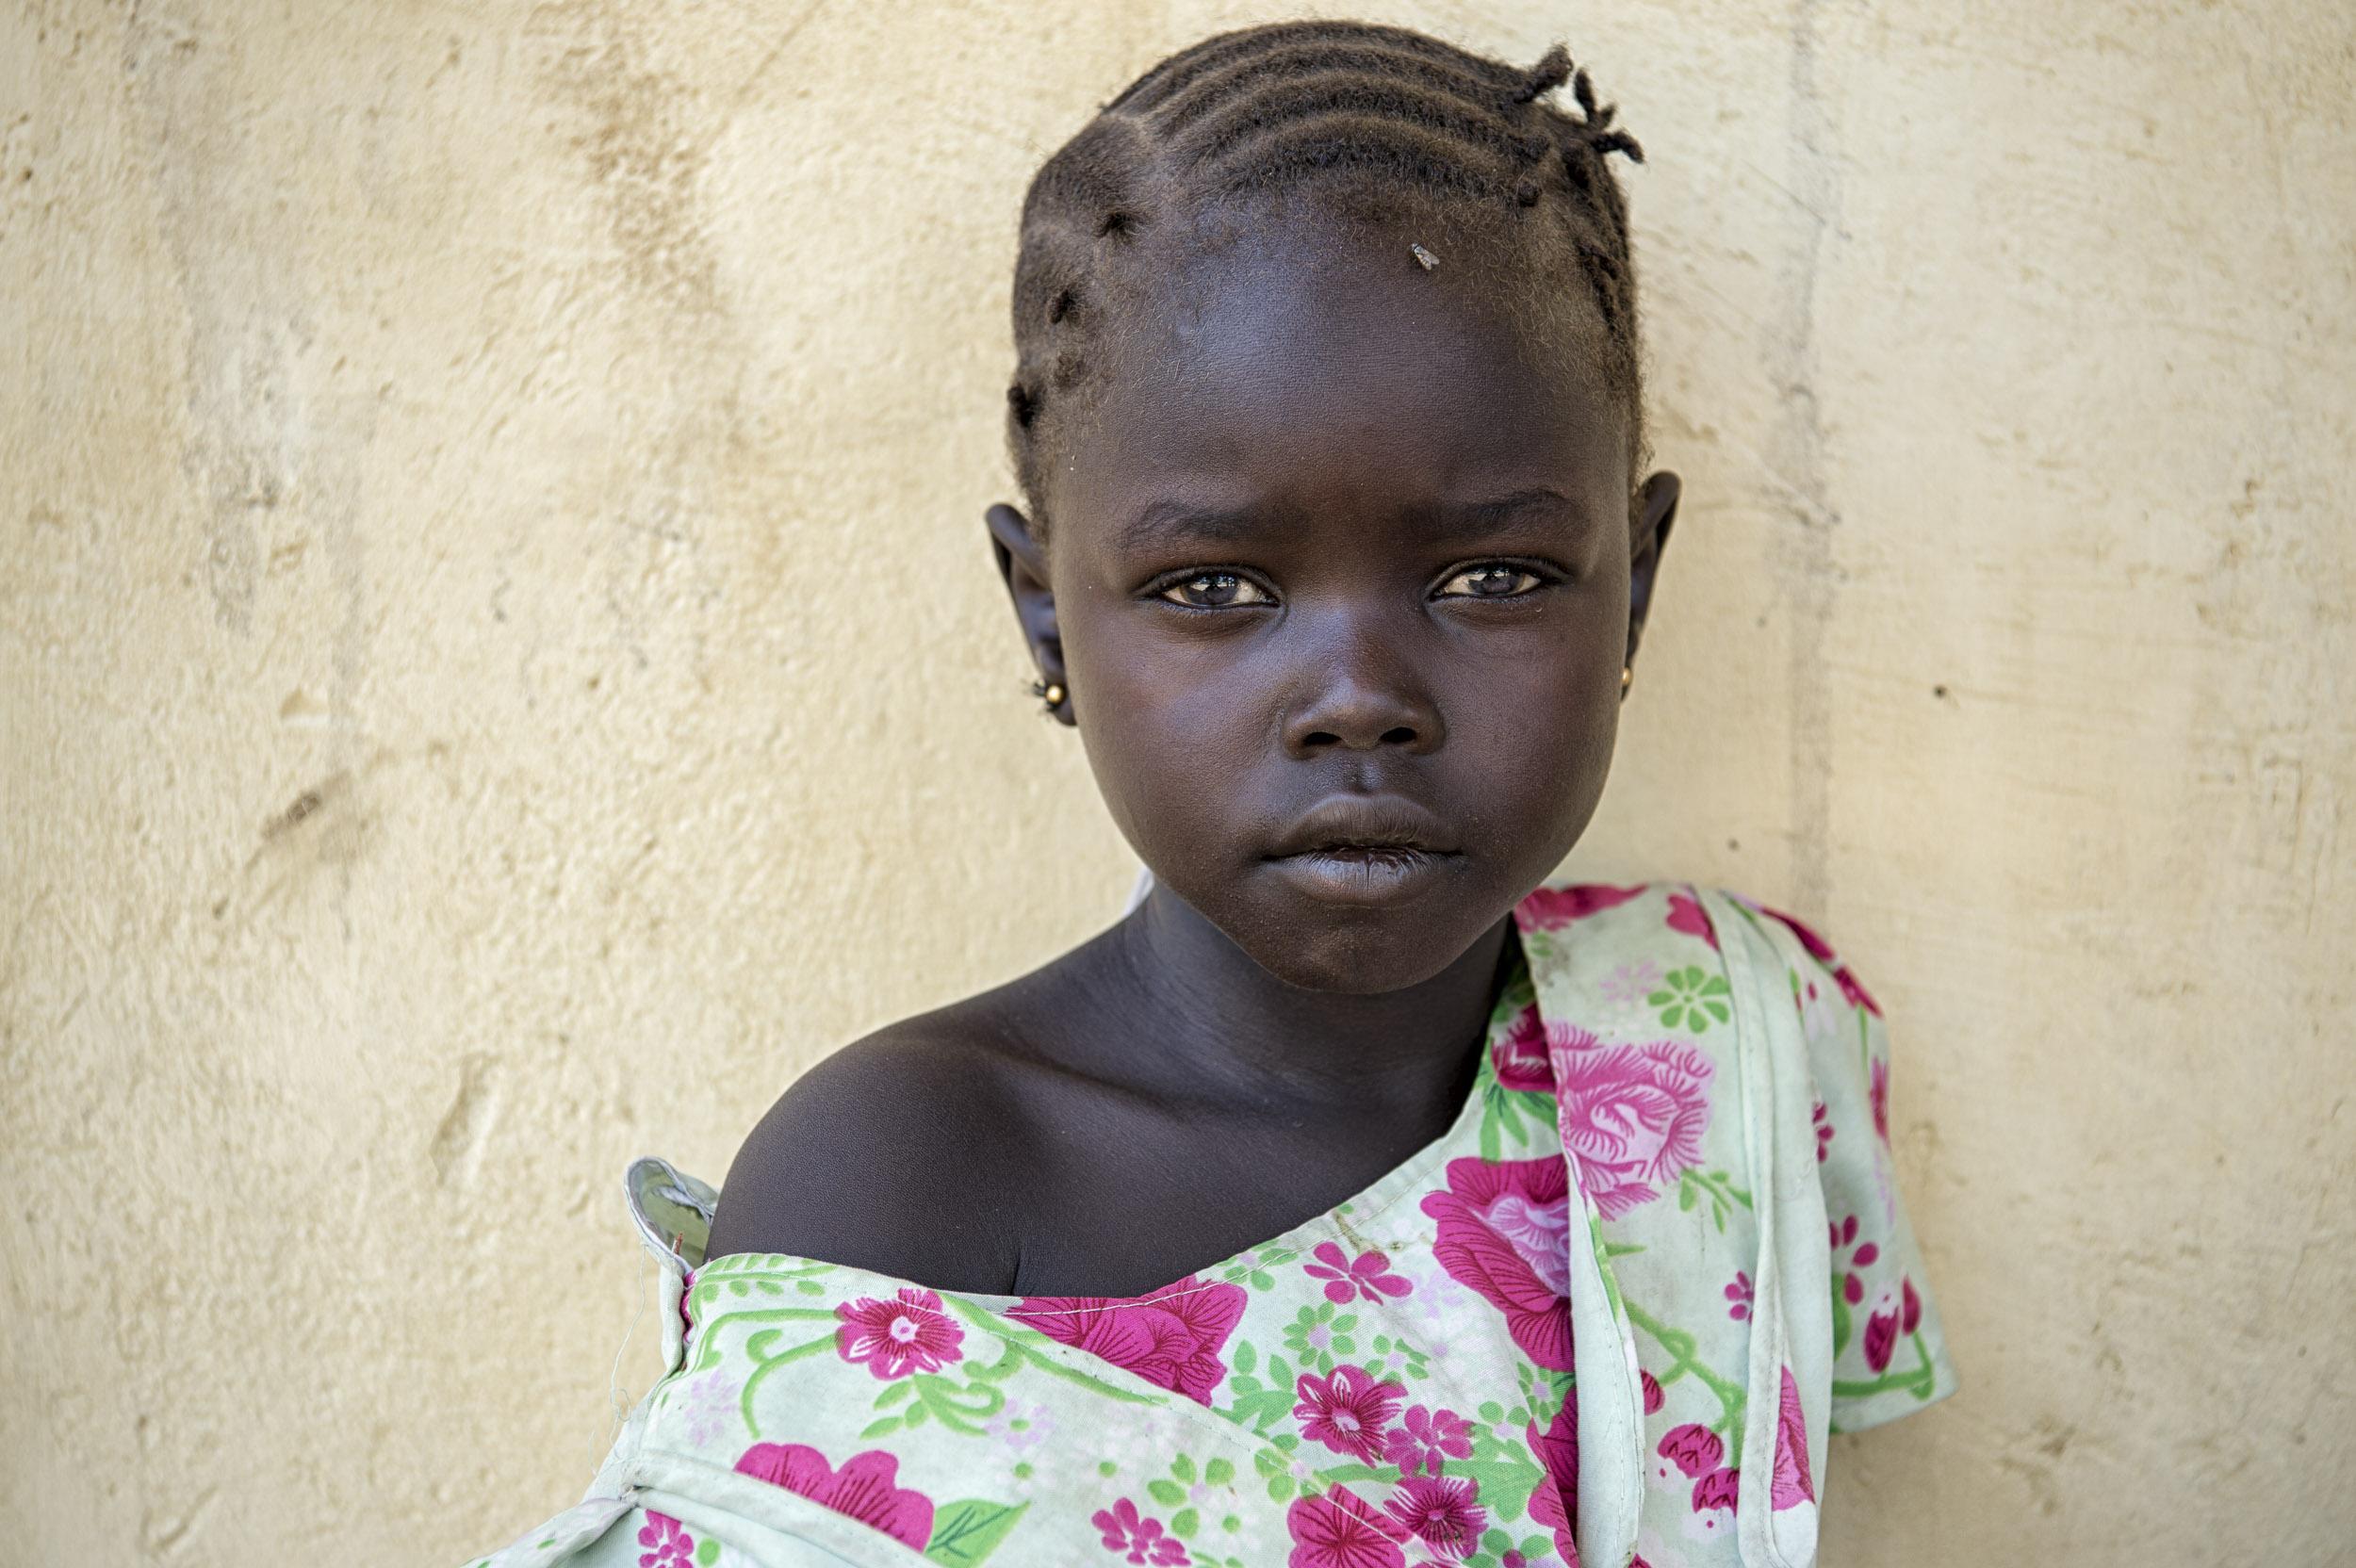 AE_SS16_UNICEF__9340-Edit.jpg